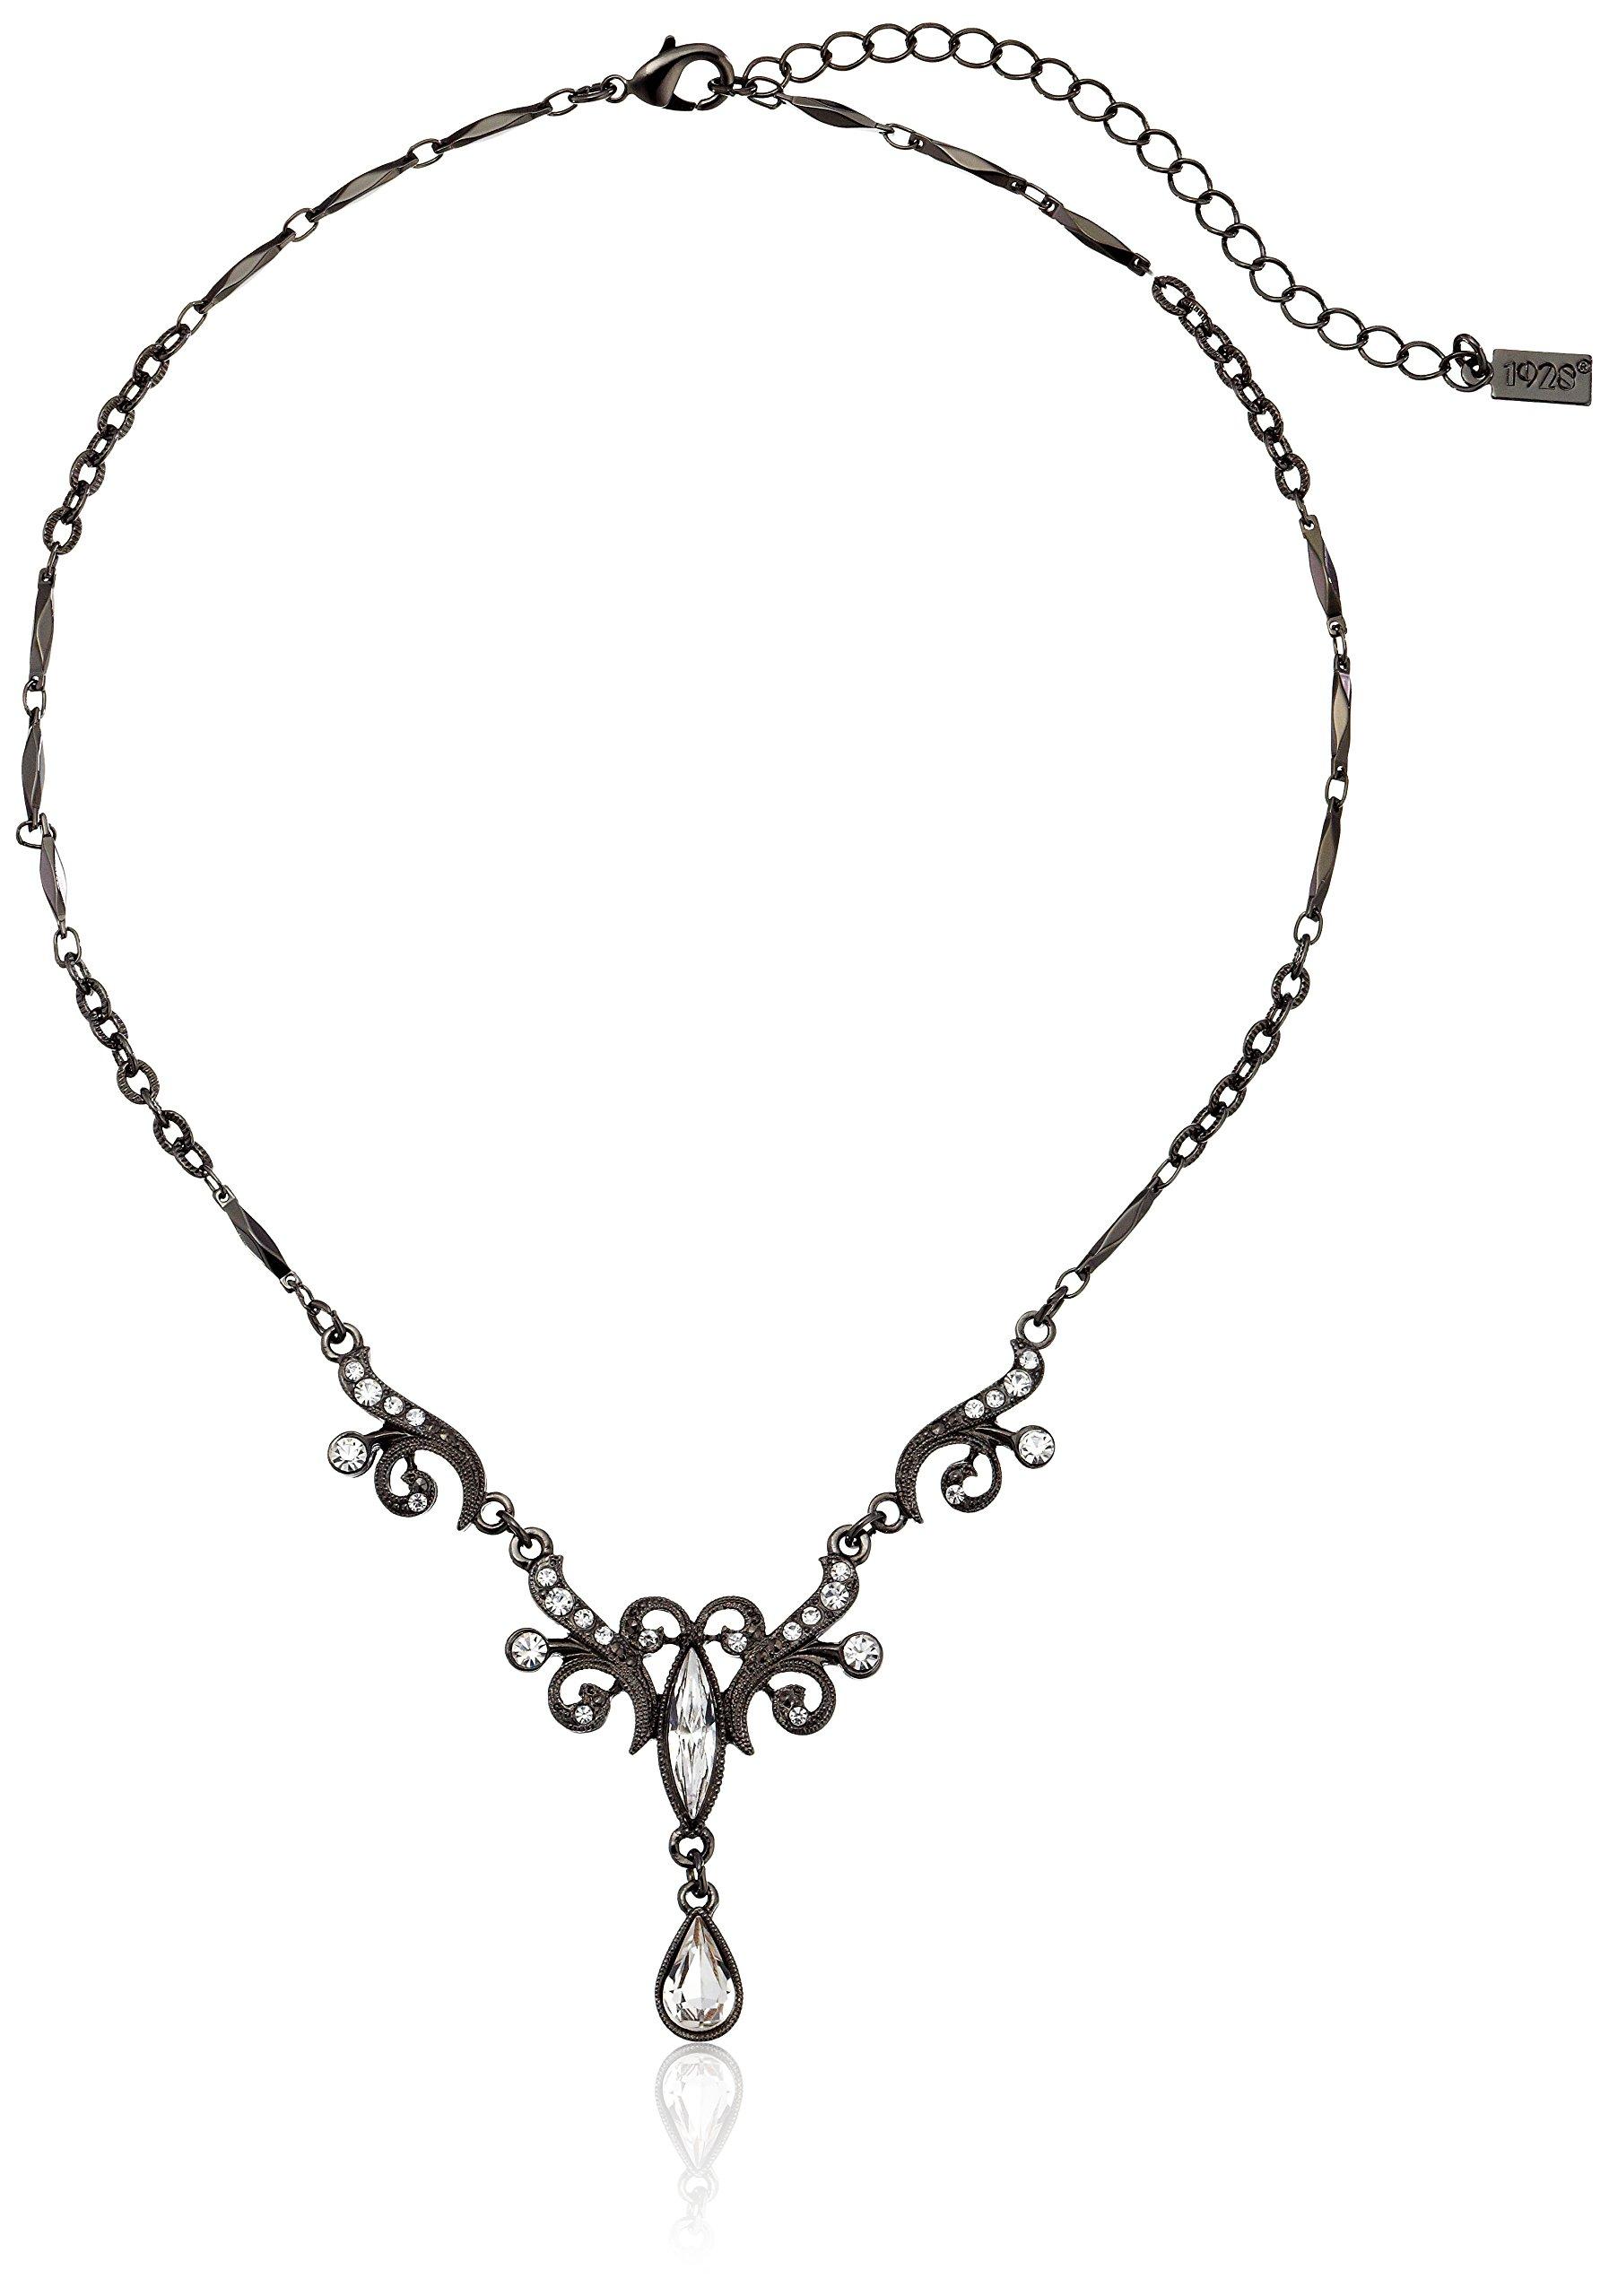 1928 Jewelry Black-Tone Crystal Teardrop Y-Shape Necklace, 15''